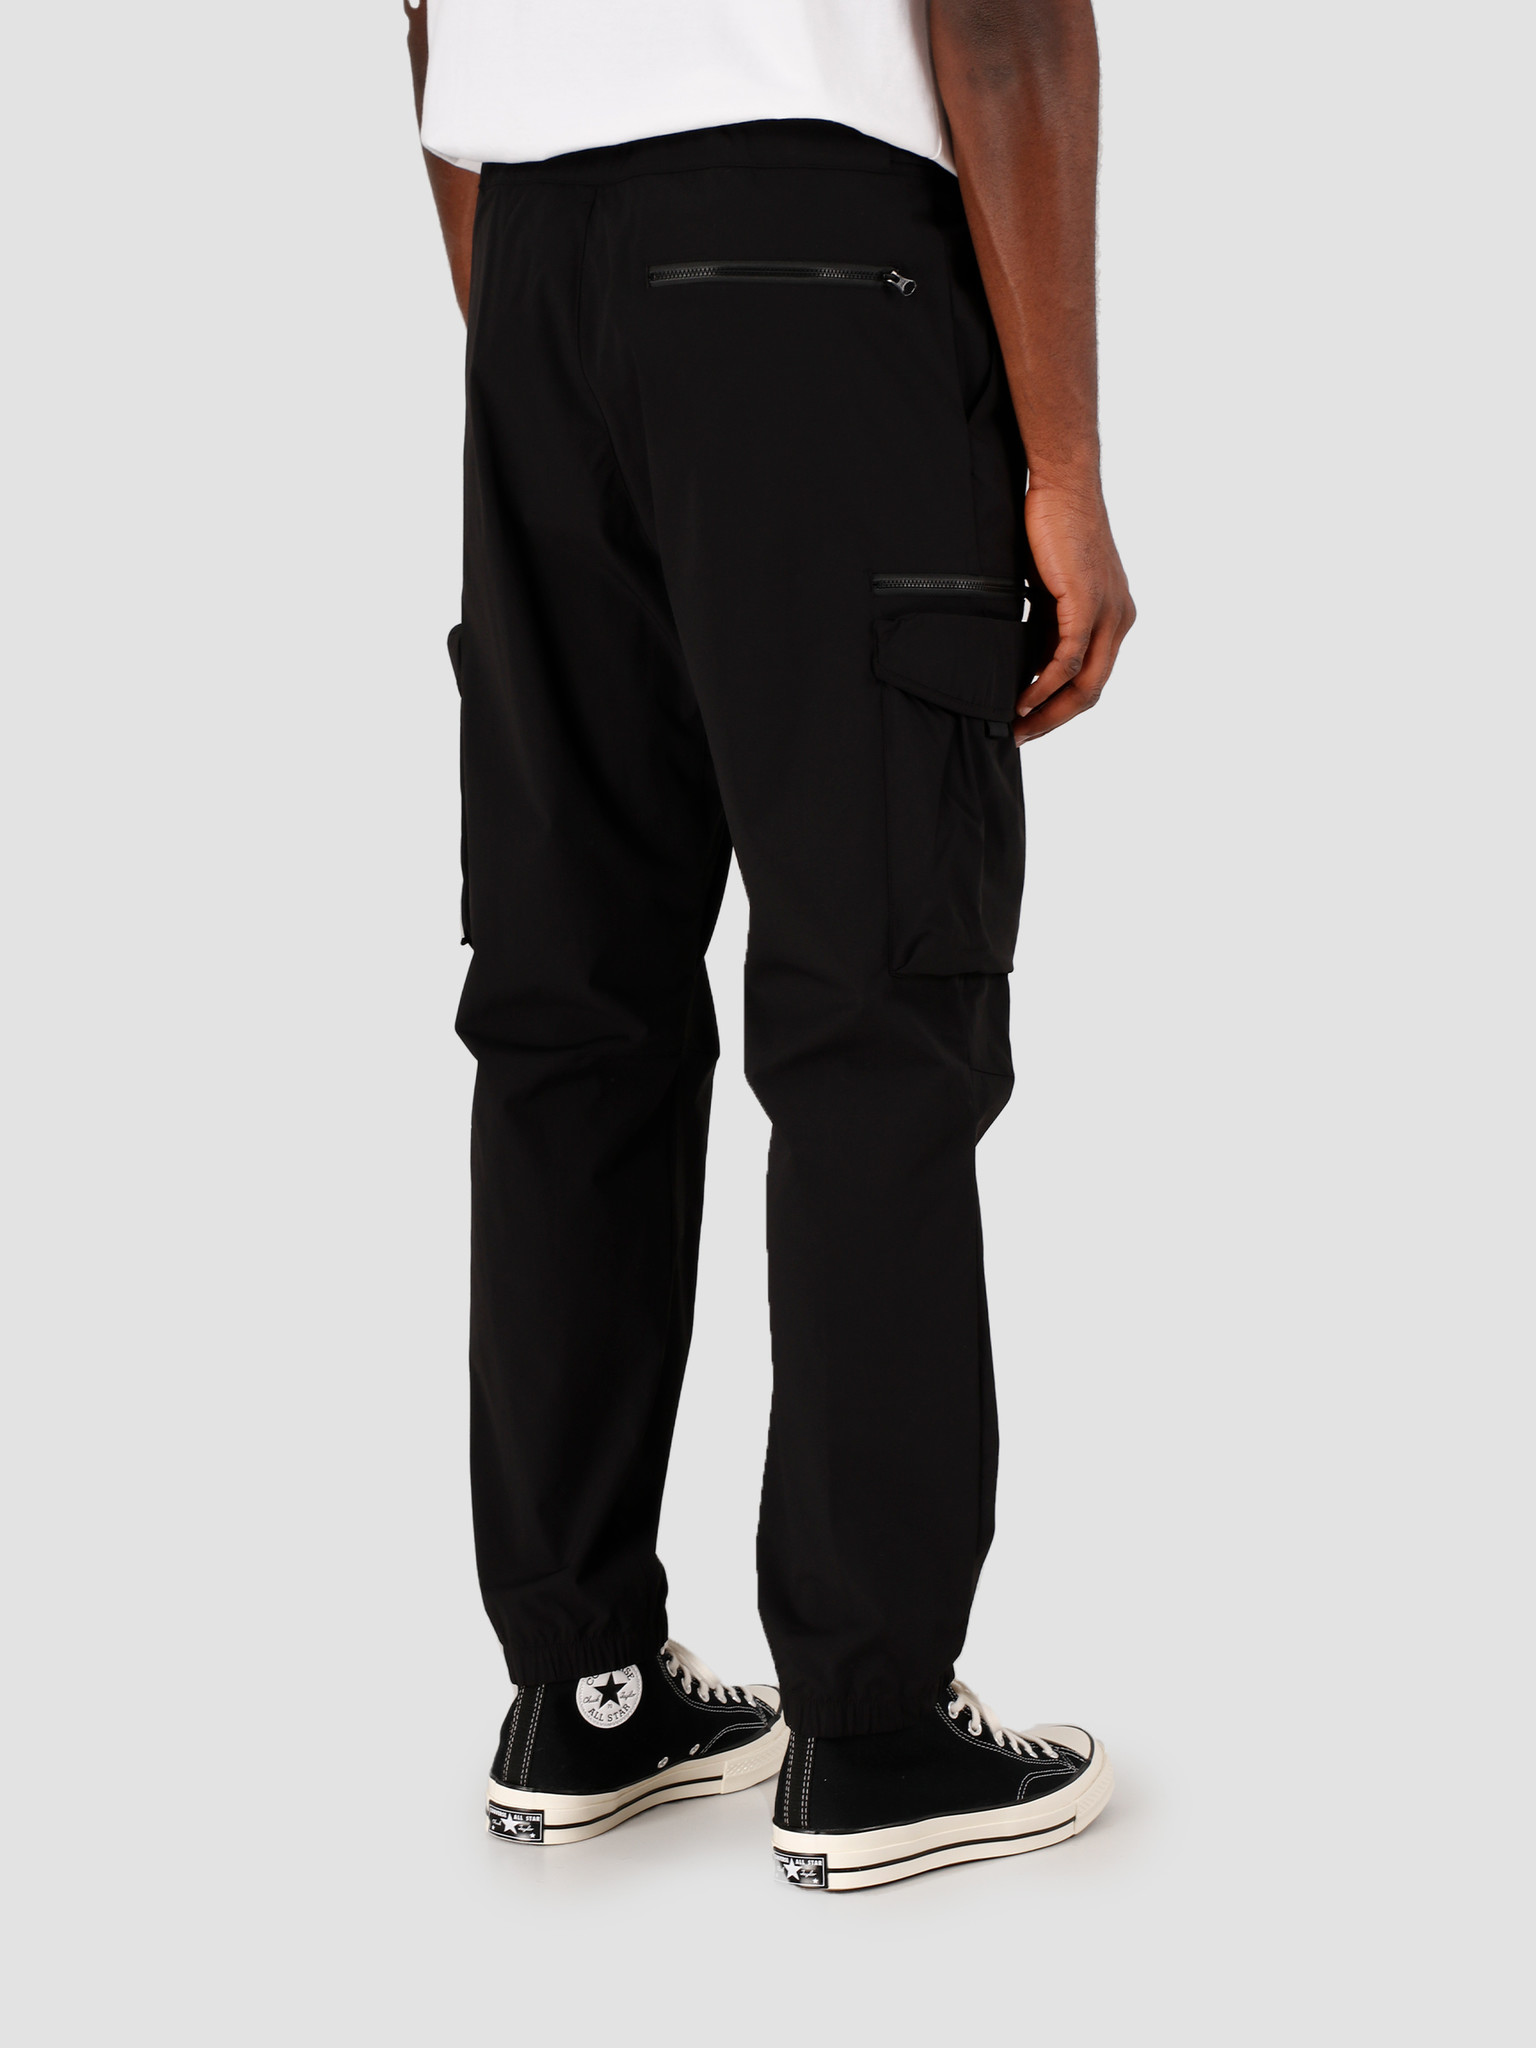 Carhartt WIP Carhartt WIP Hayes Pant Black I027598-8900